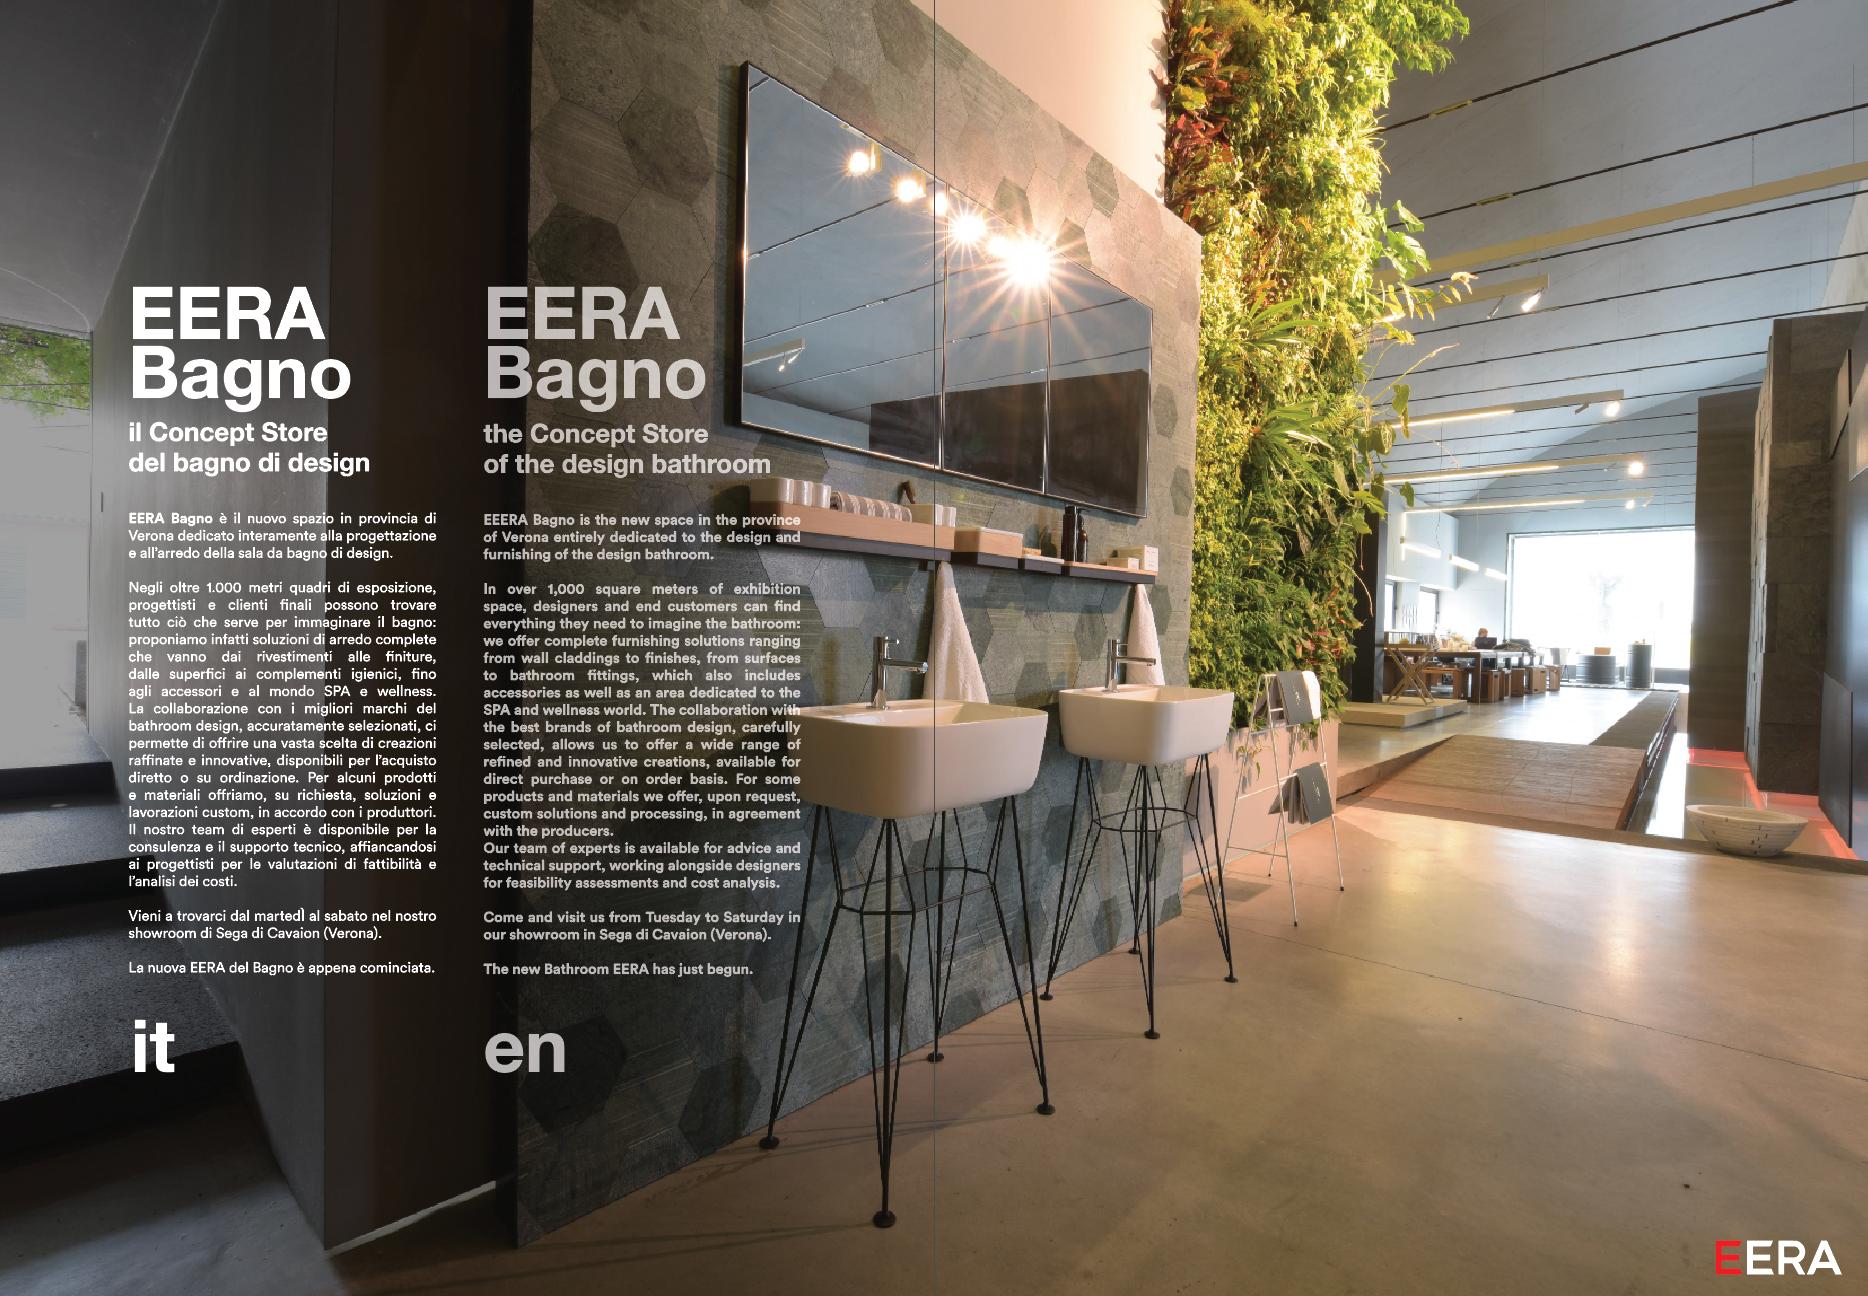 Luca Tognolo - EERA magazine